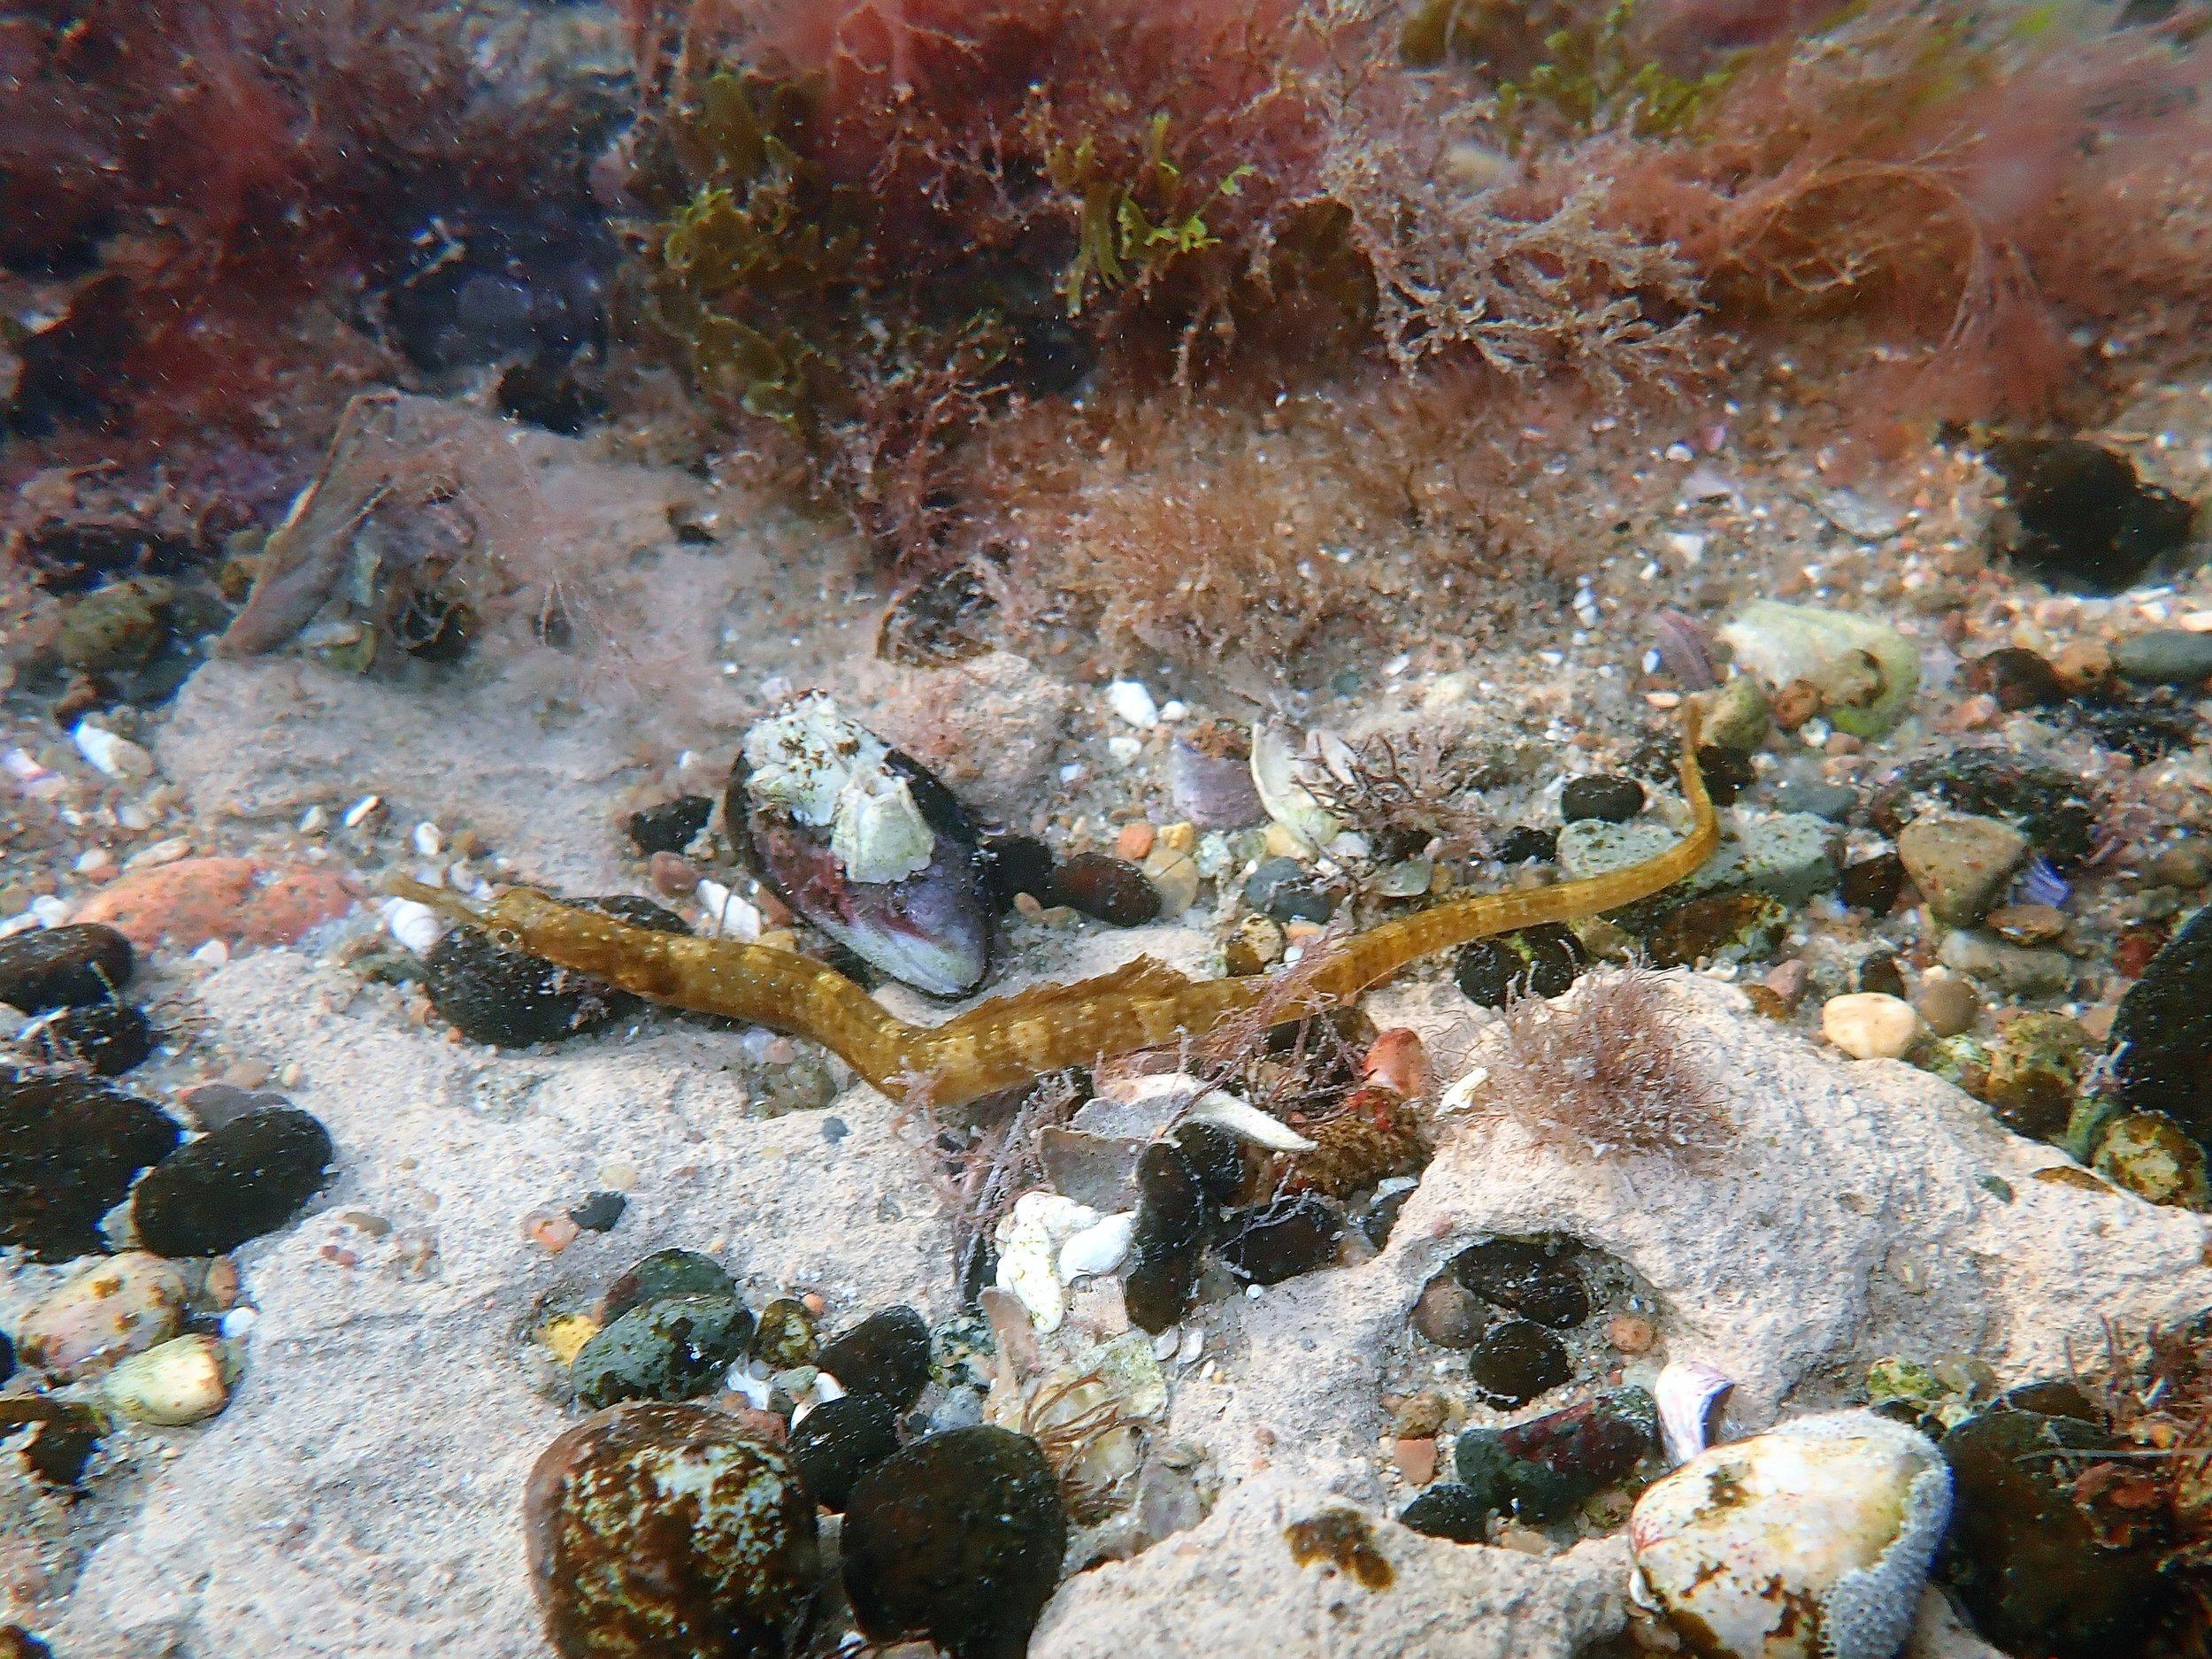 pipefish_LeptonotusVincentae_3_DiegoLuzzatto.jpg